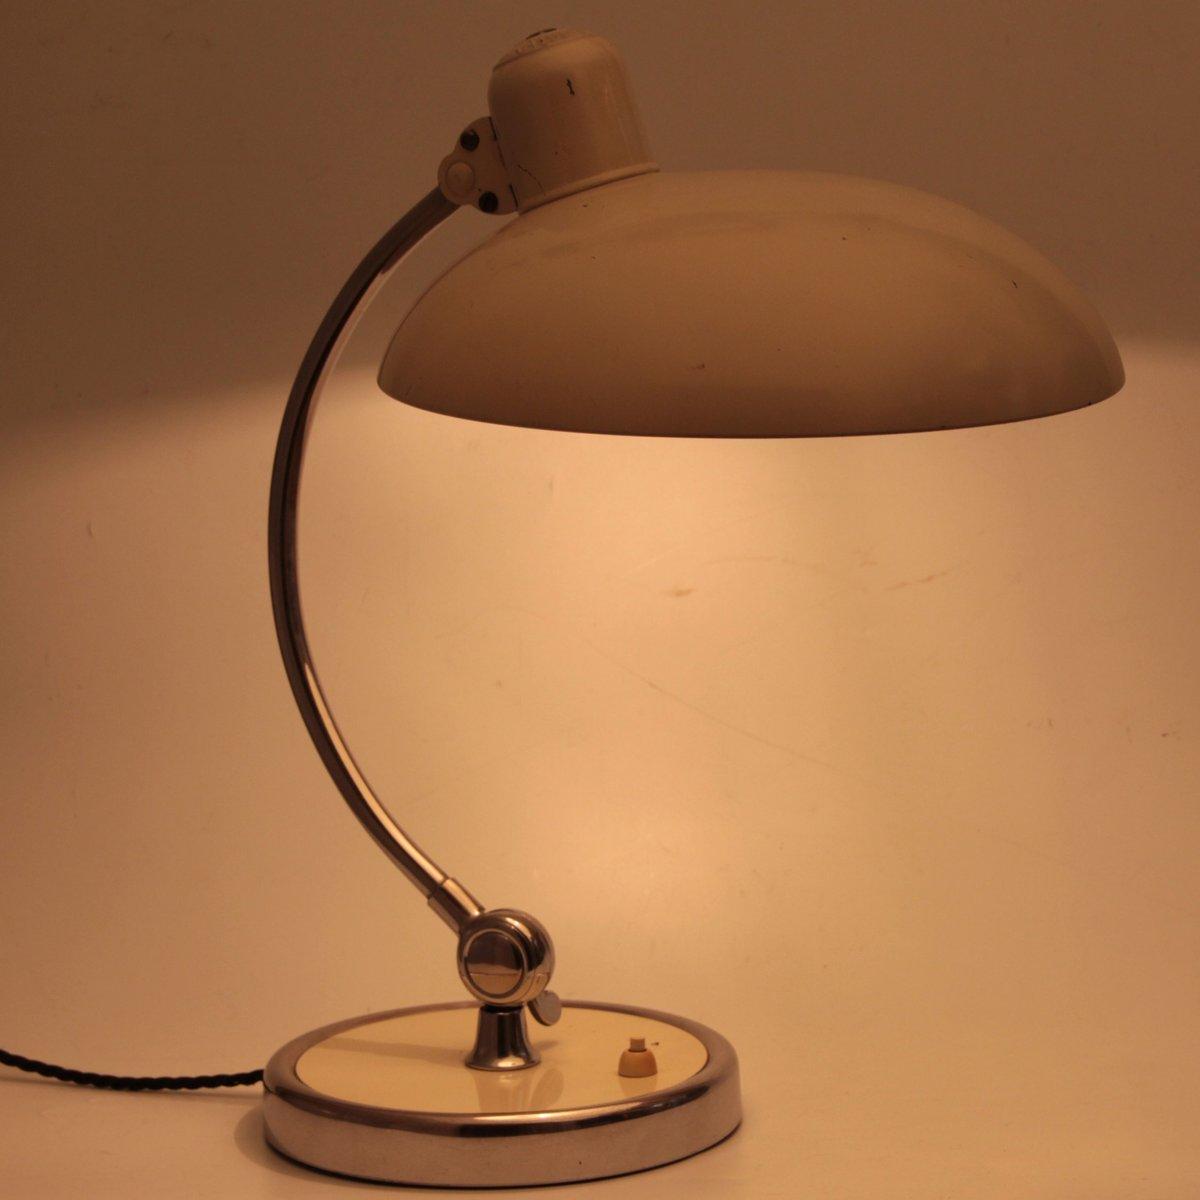 kaiser idell 6631 tischlampe von christian dell f r kaiser. Black Bedroom Furniture Sets. Home Design Ideas